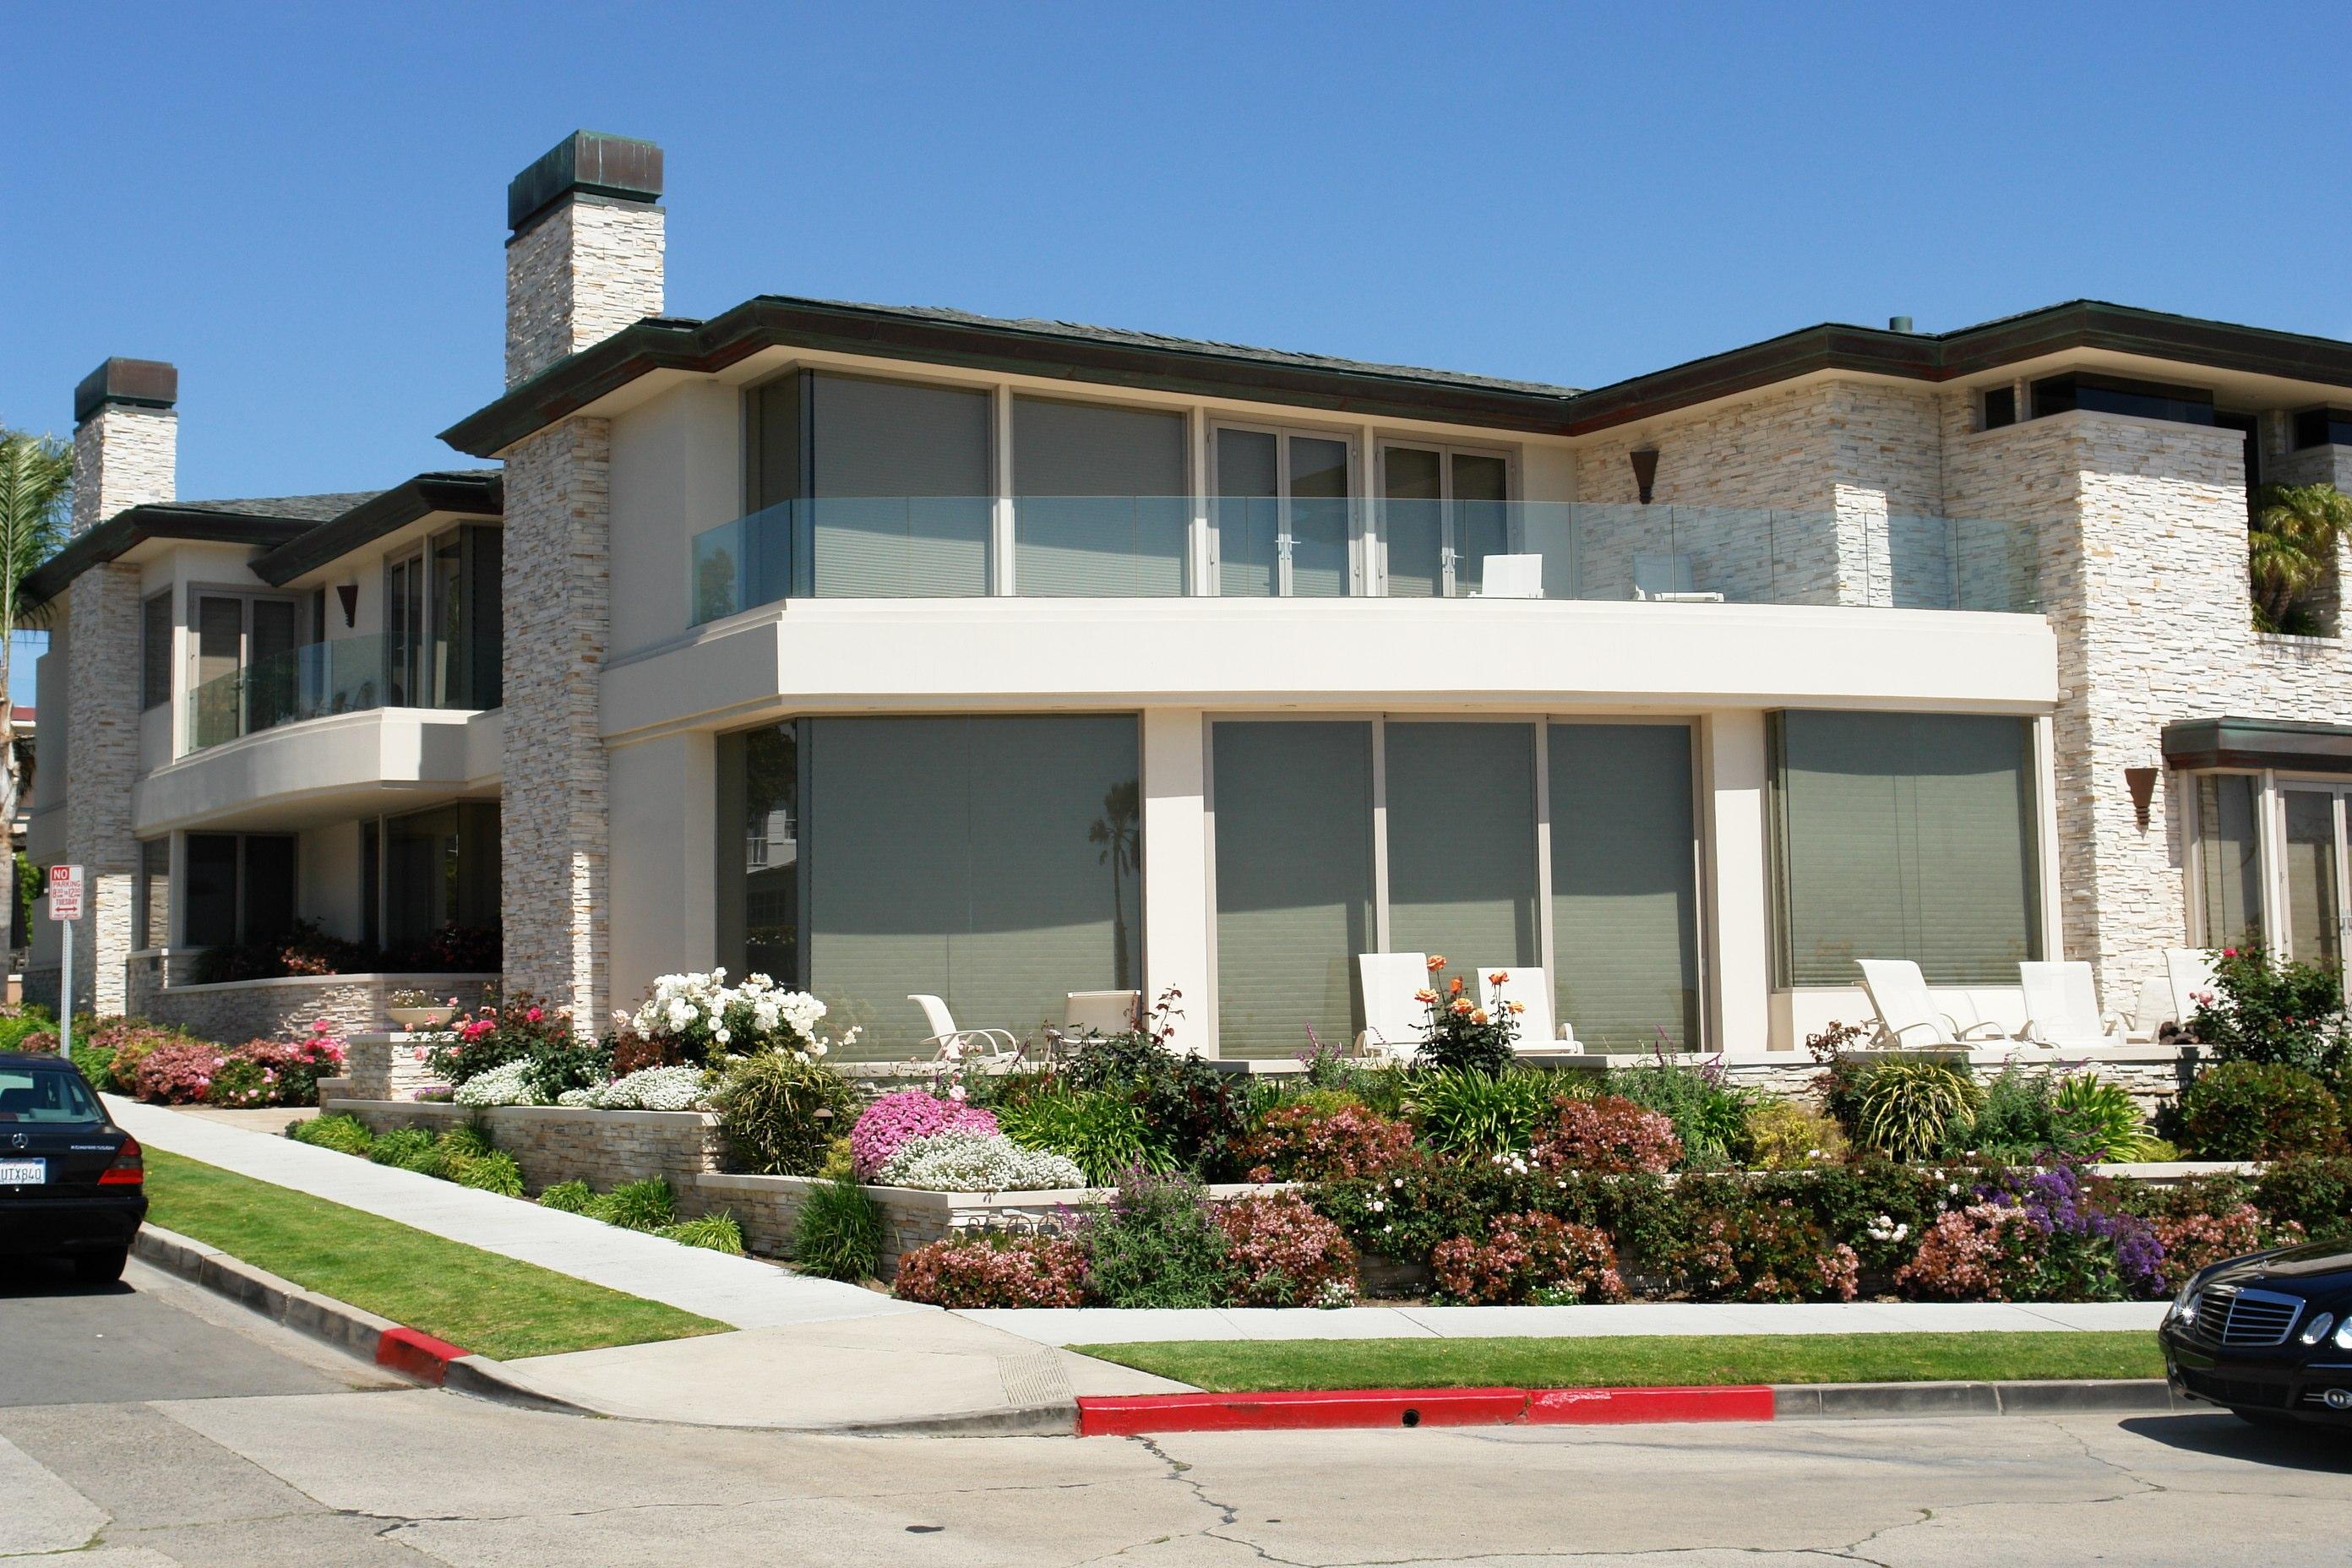 File House At Dana Point California 3436678333 Jpg Wikimedia Commons